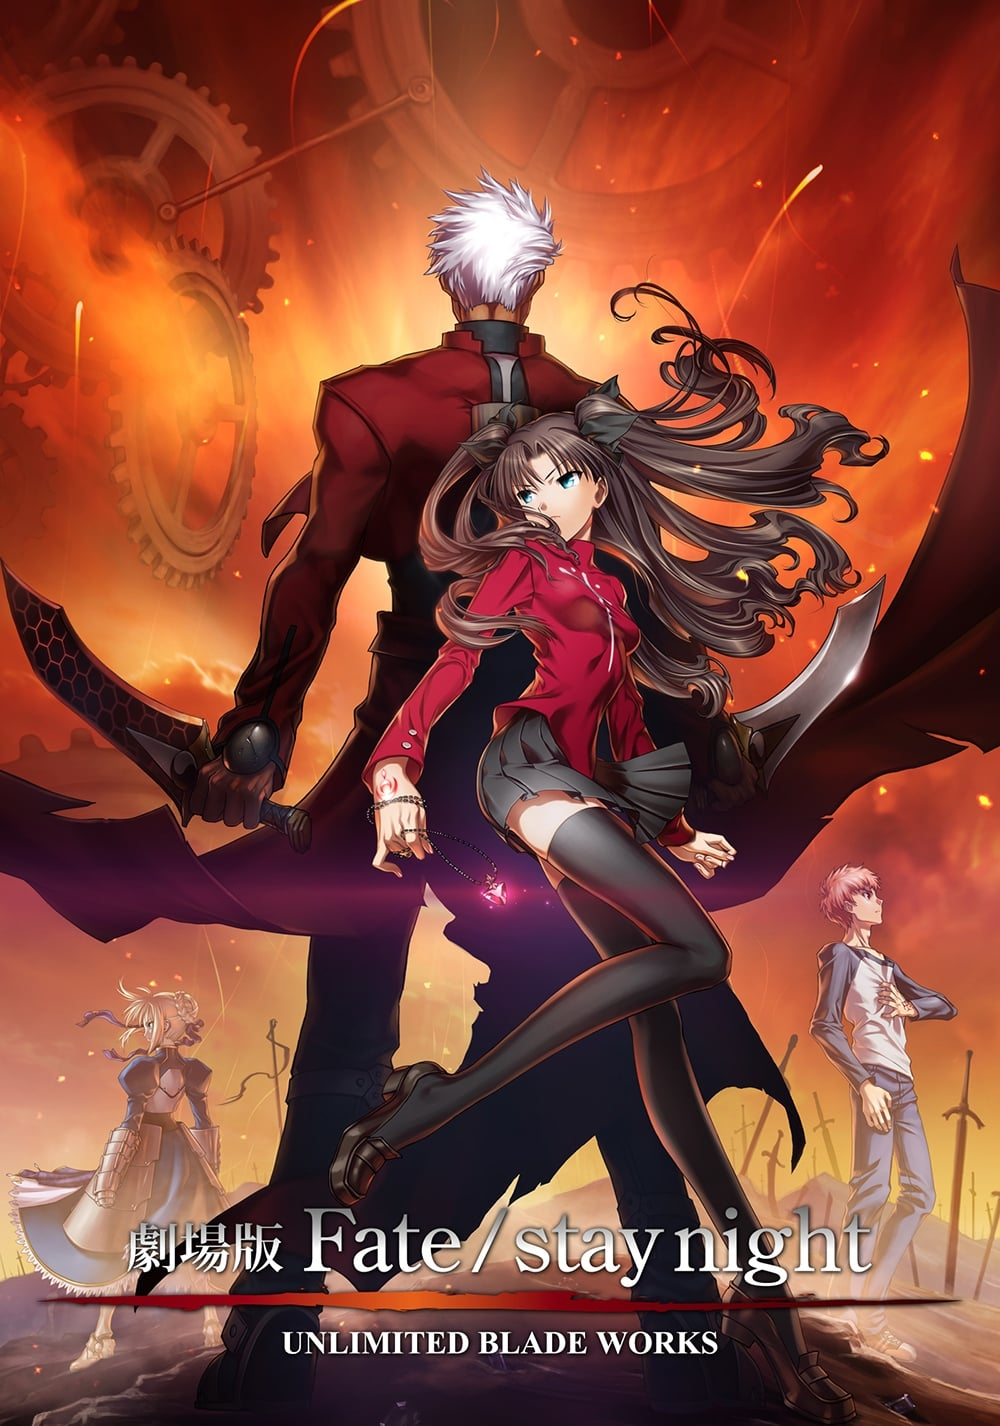 Crunchyroll - Rei Ayanami Kills Fate/stay night Servants